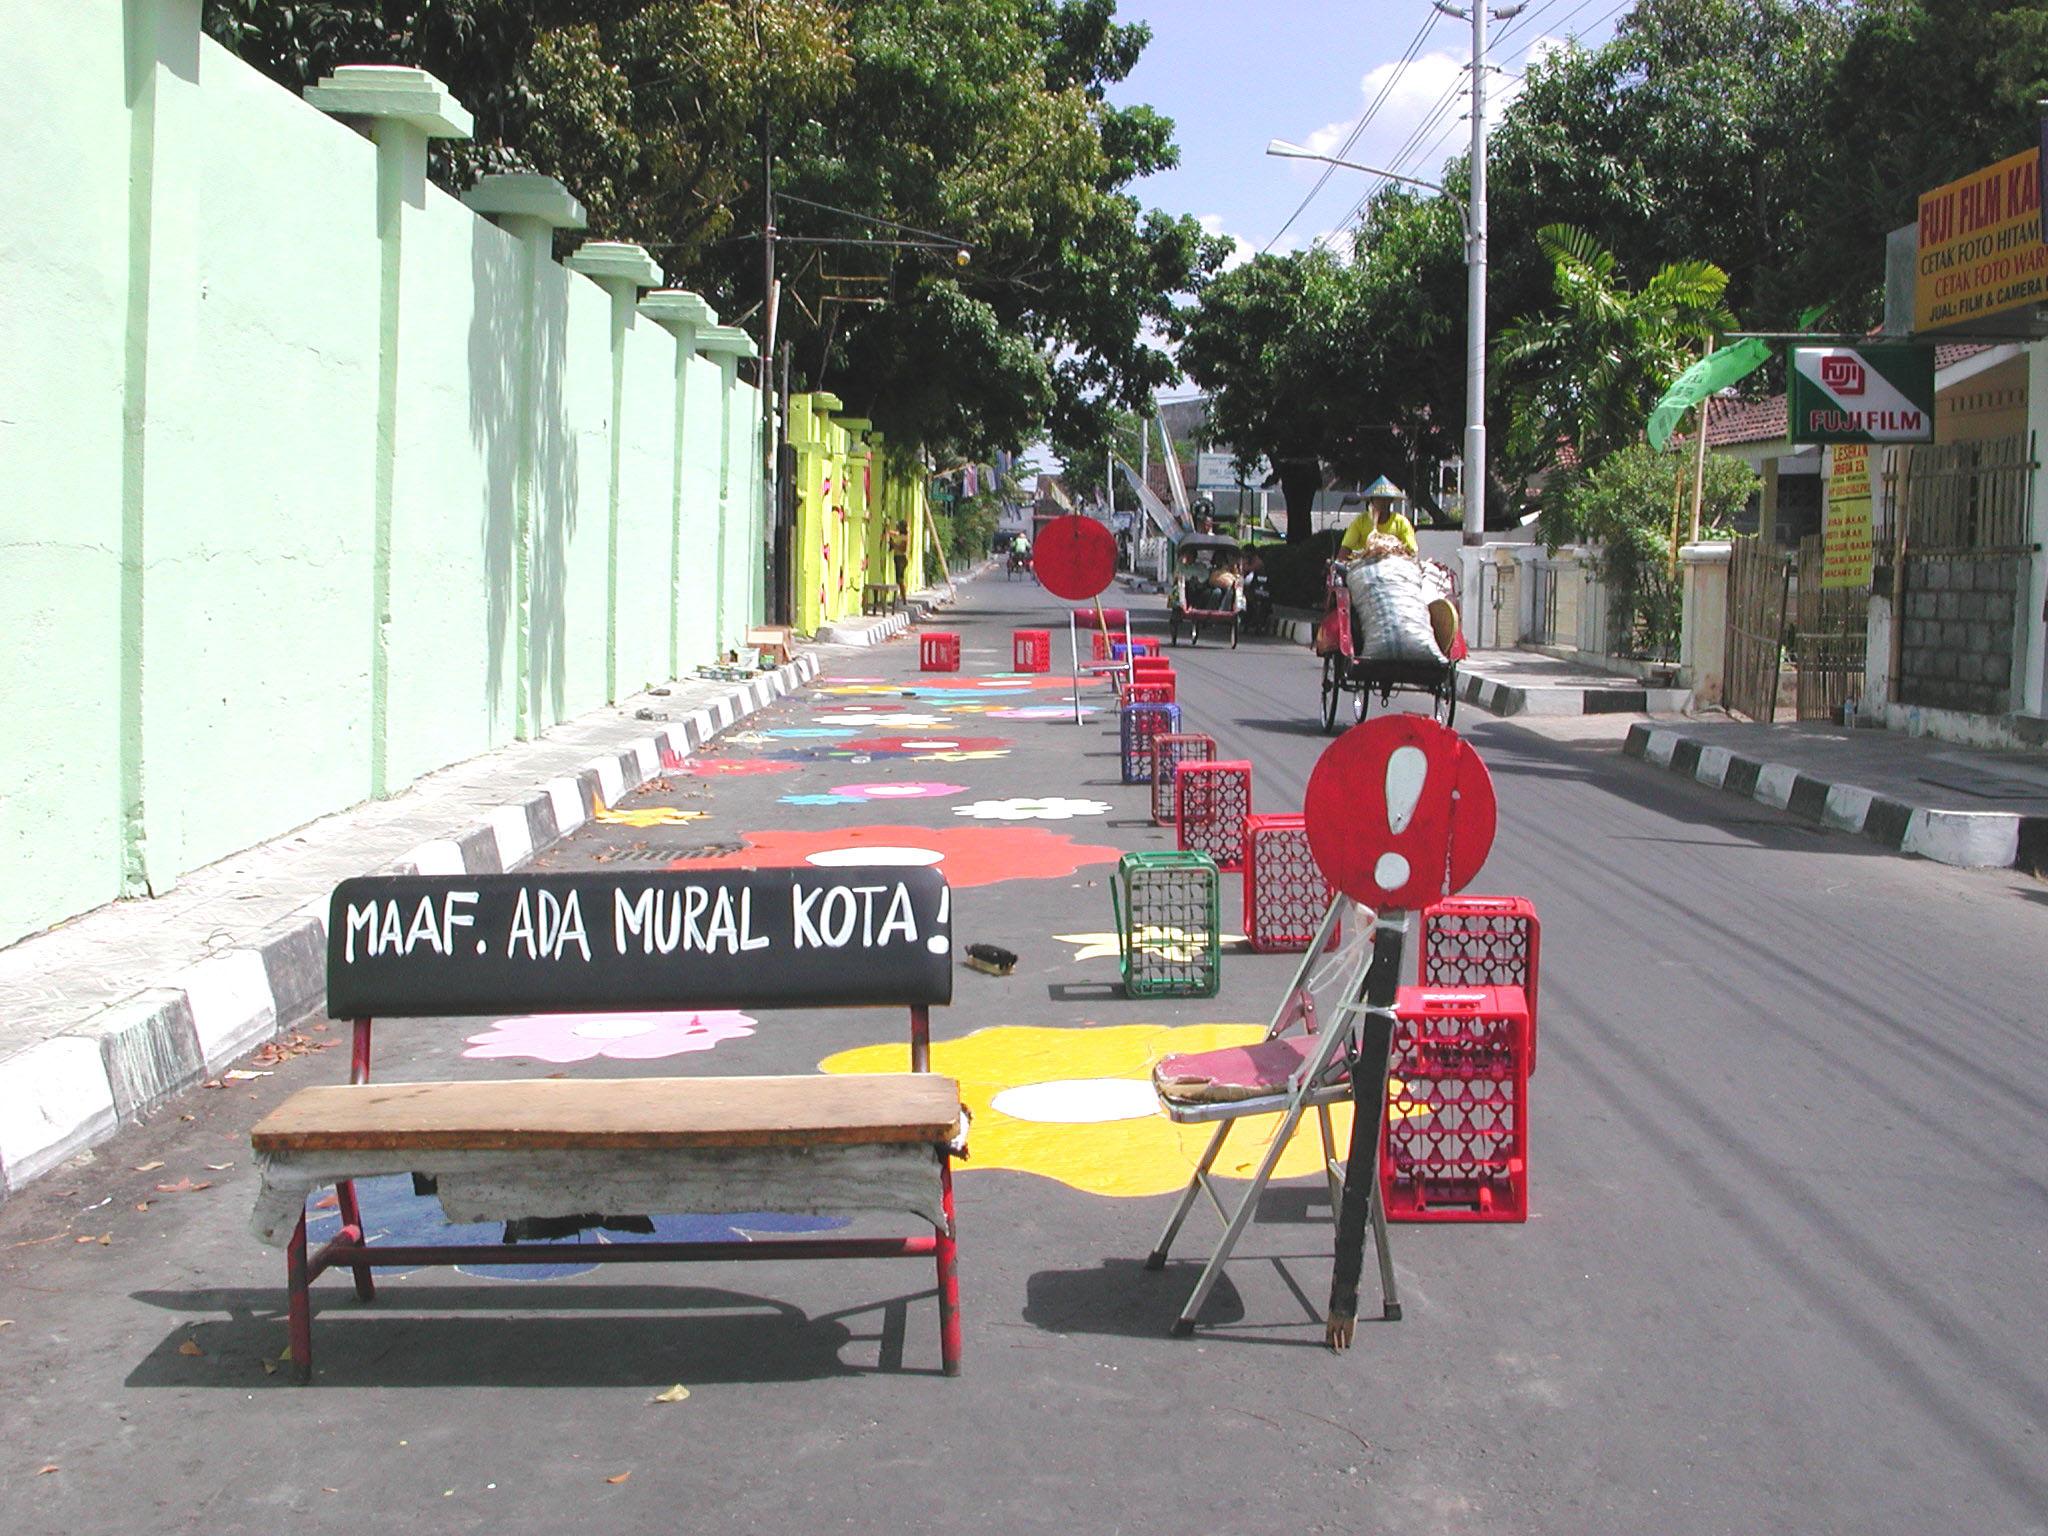 Megan Maaf Ada Mural Kota -- flowers on road.jpg